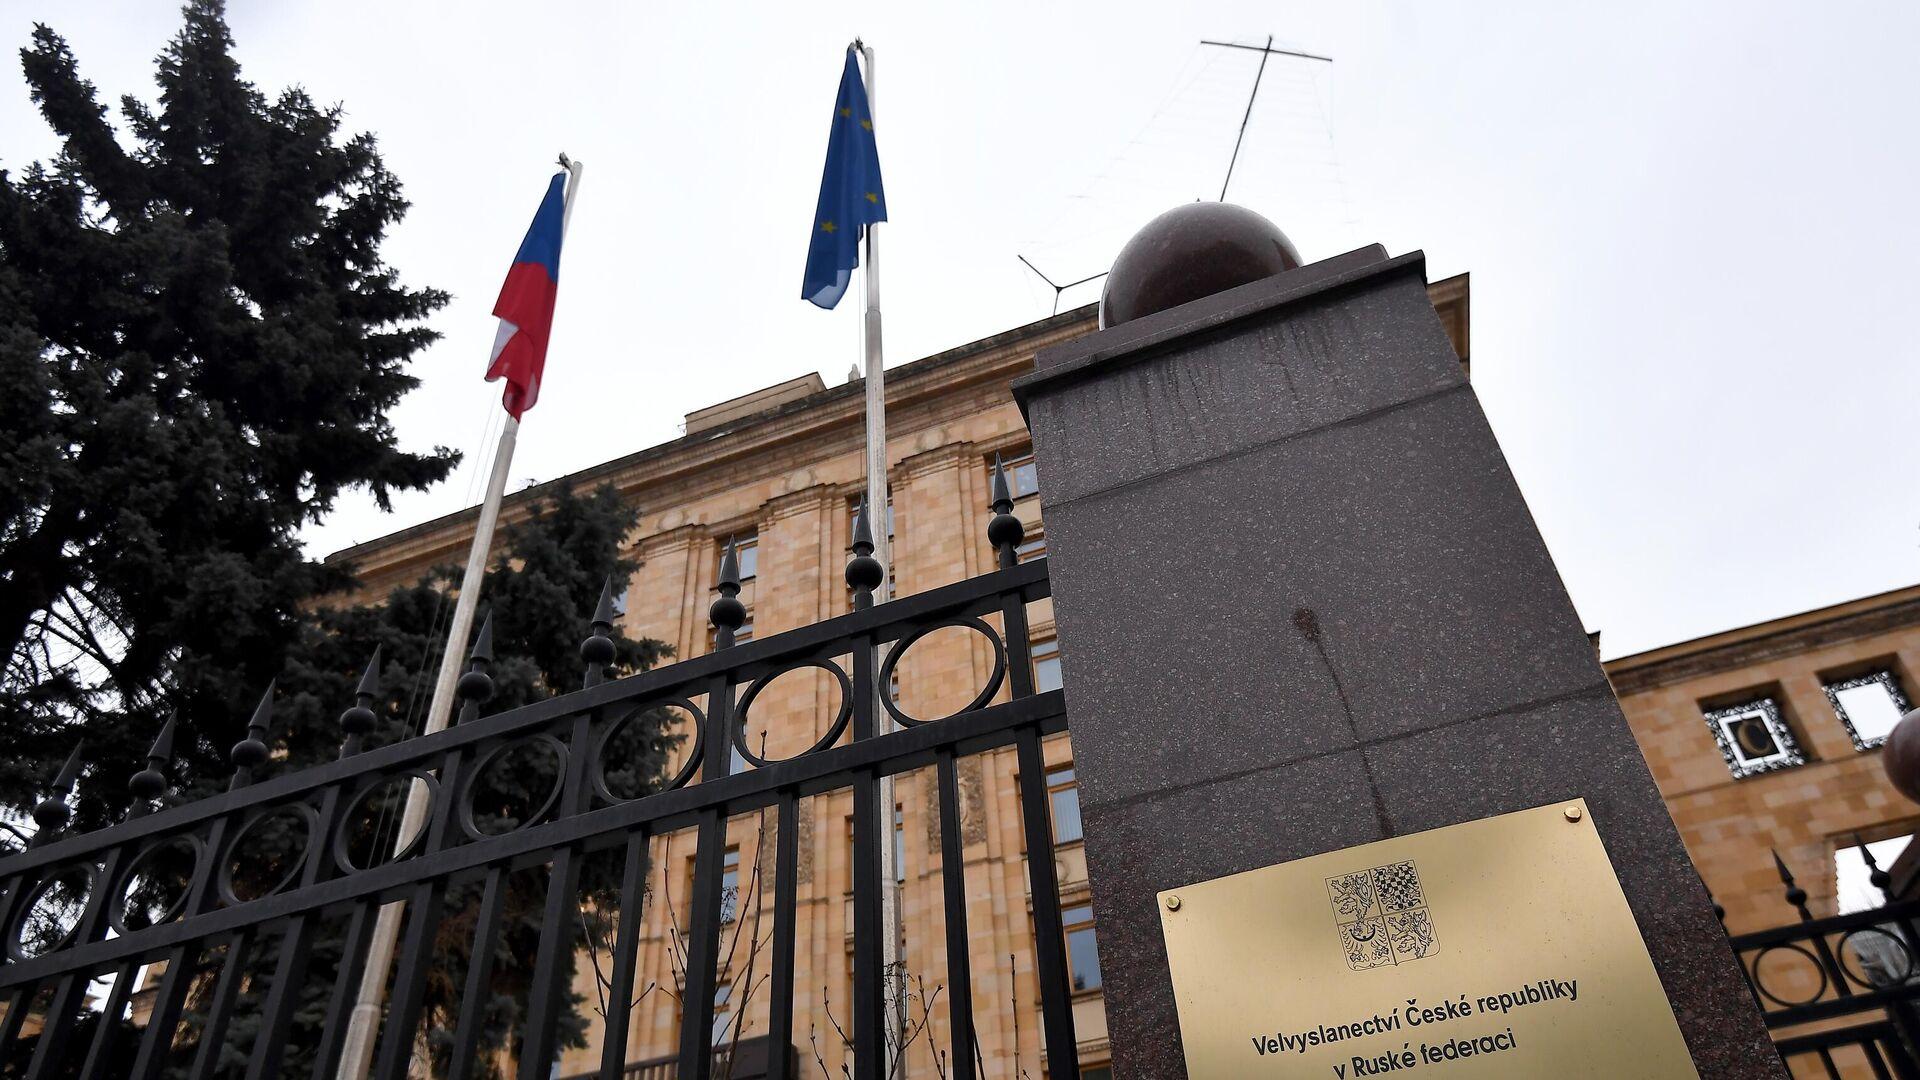 La Embajada de la República Checa en Moscú - Sputnik Mundo, 1920, 19.04.2021